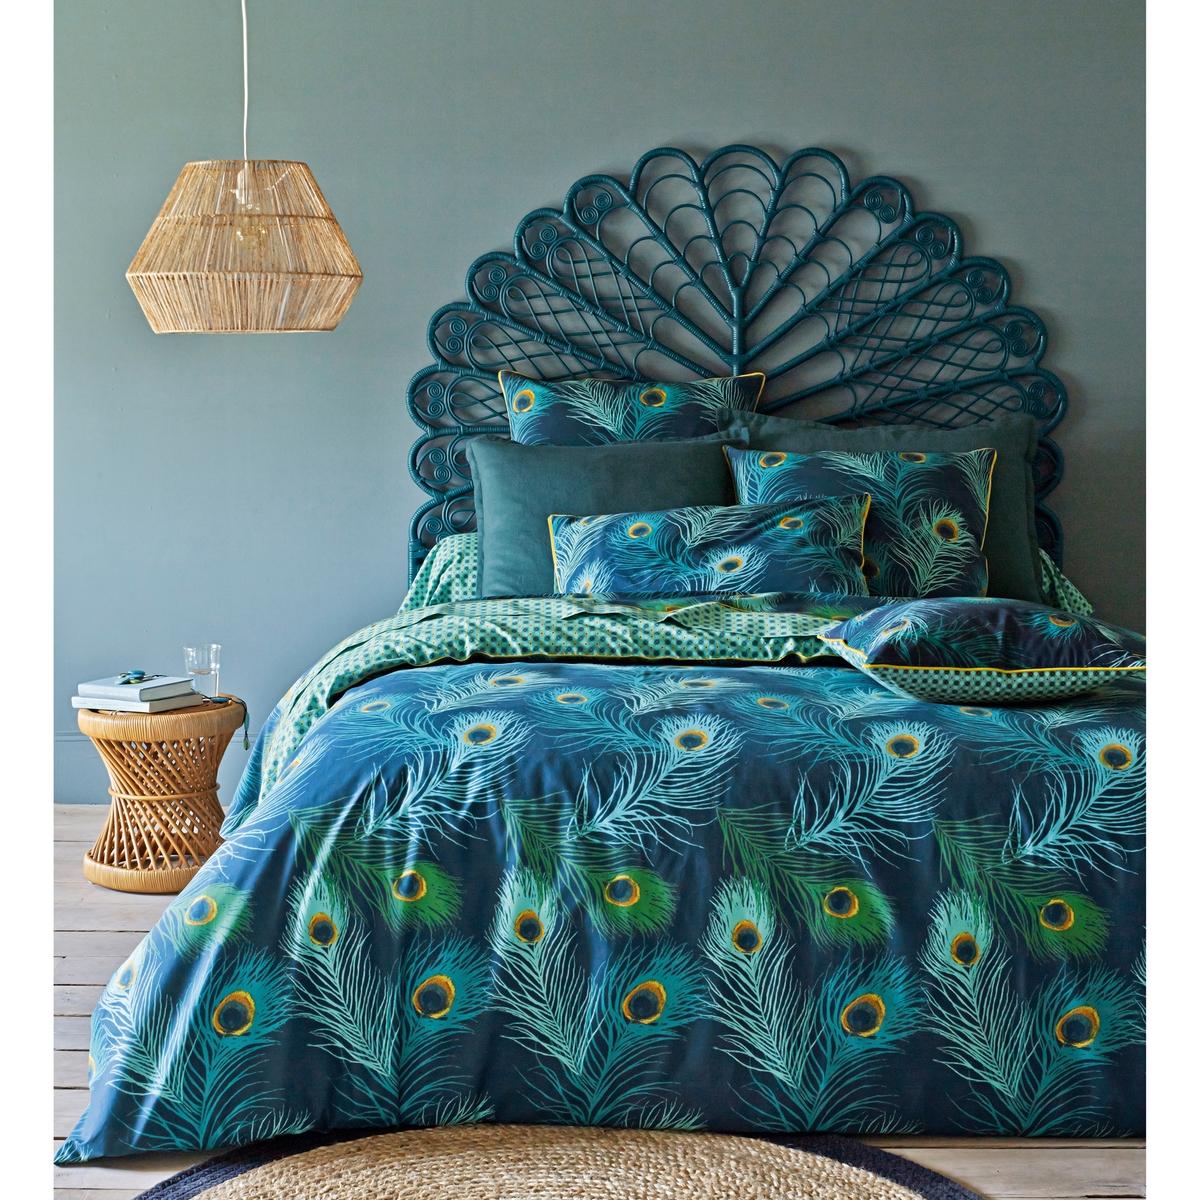 Shakhra Cotton Percale Duvet Cover